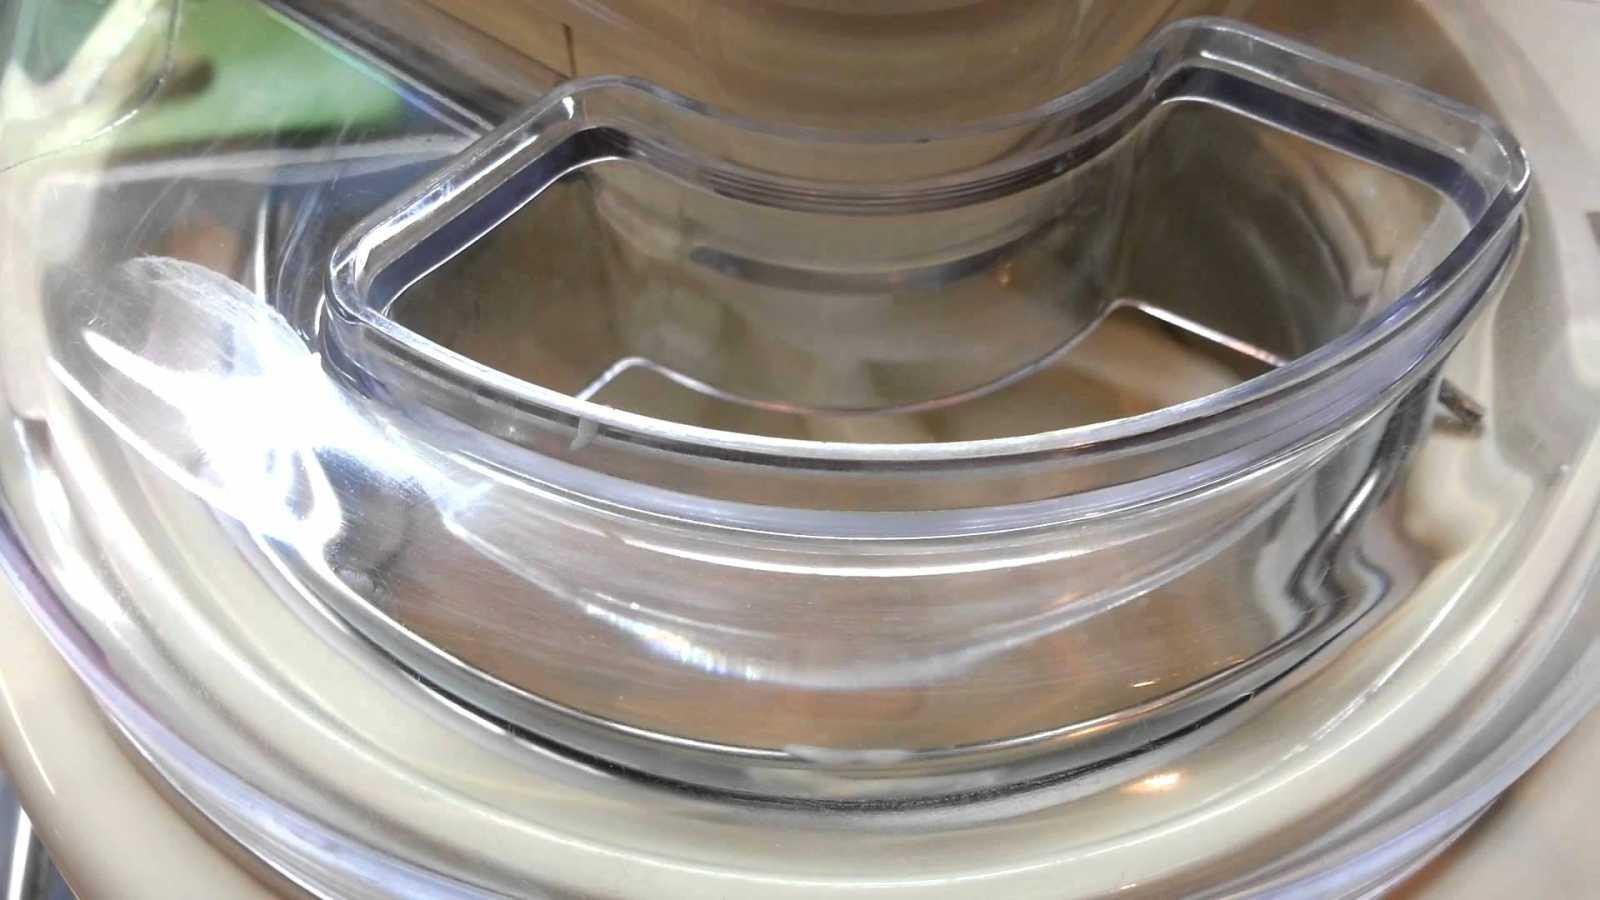 Мороженица автоматическая Nemox Talent Gelato & Sorbet, 26,5х33,5х24,5 см, белый Nemox                                                  0036500450 фото 4